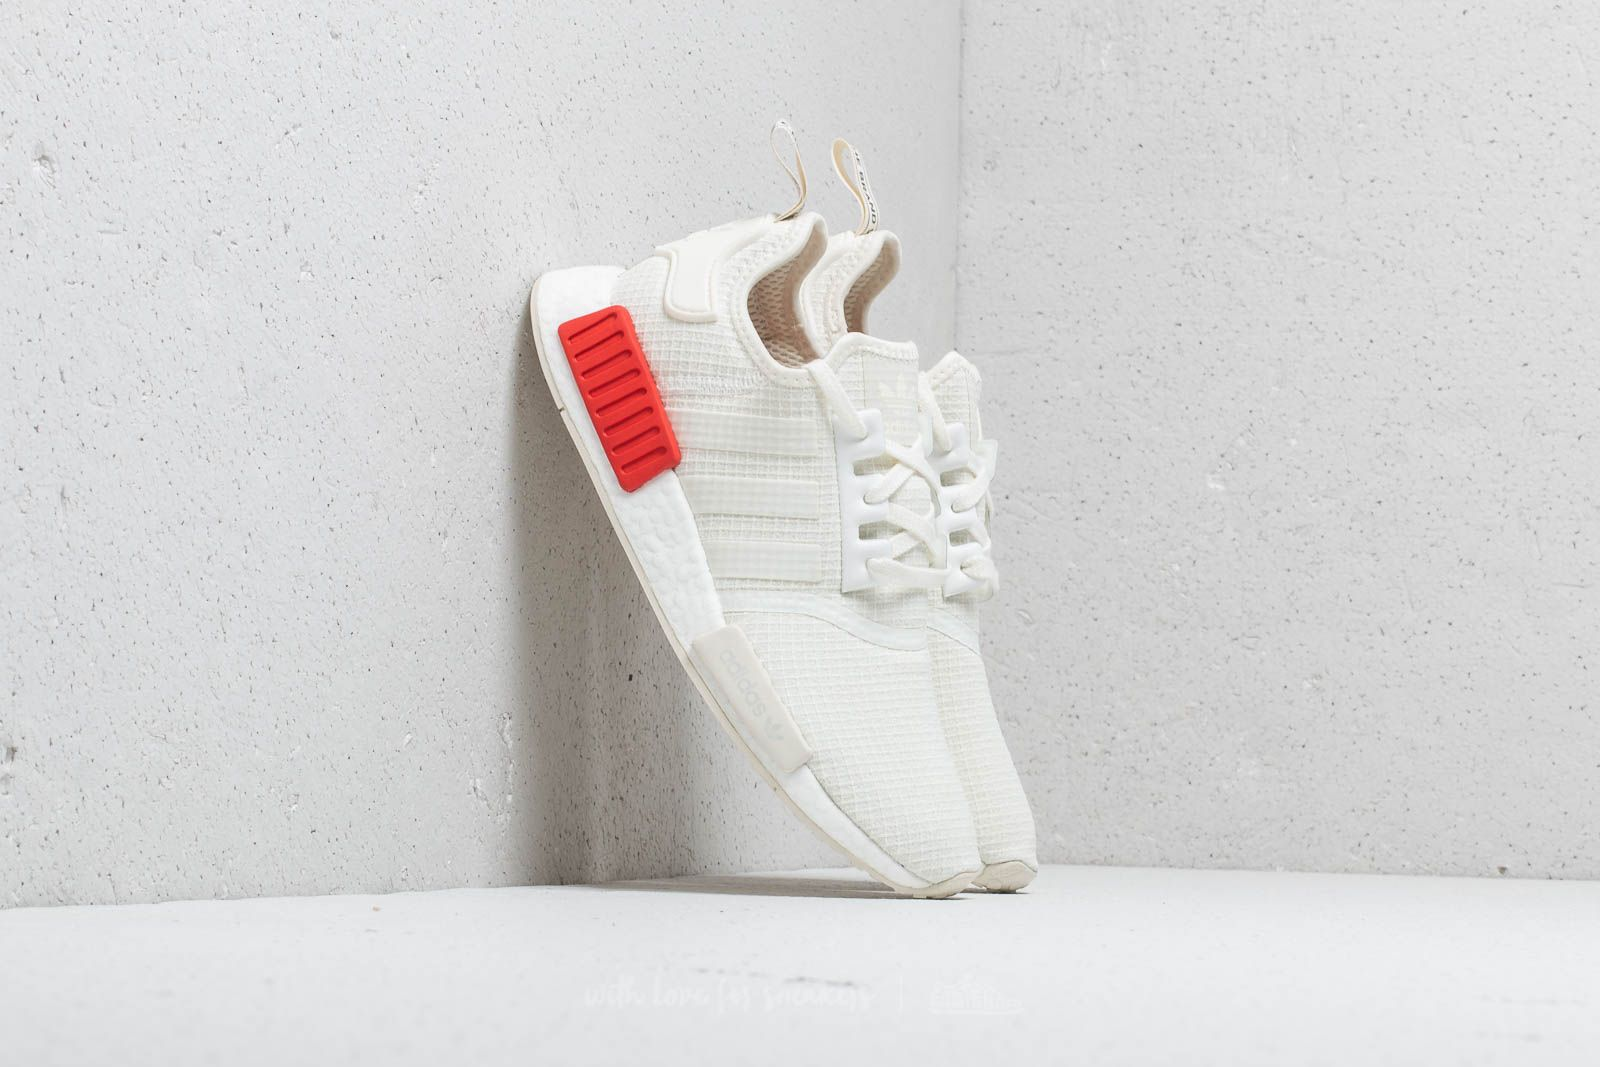 online retailer 3357f 626ec adidas NMD_R1 Off White/ Off White/ Lush Red   Footshop